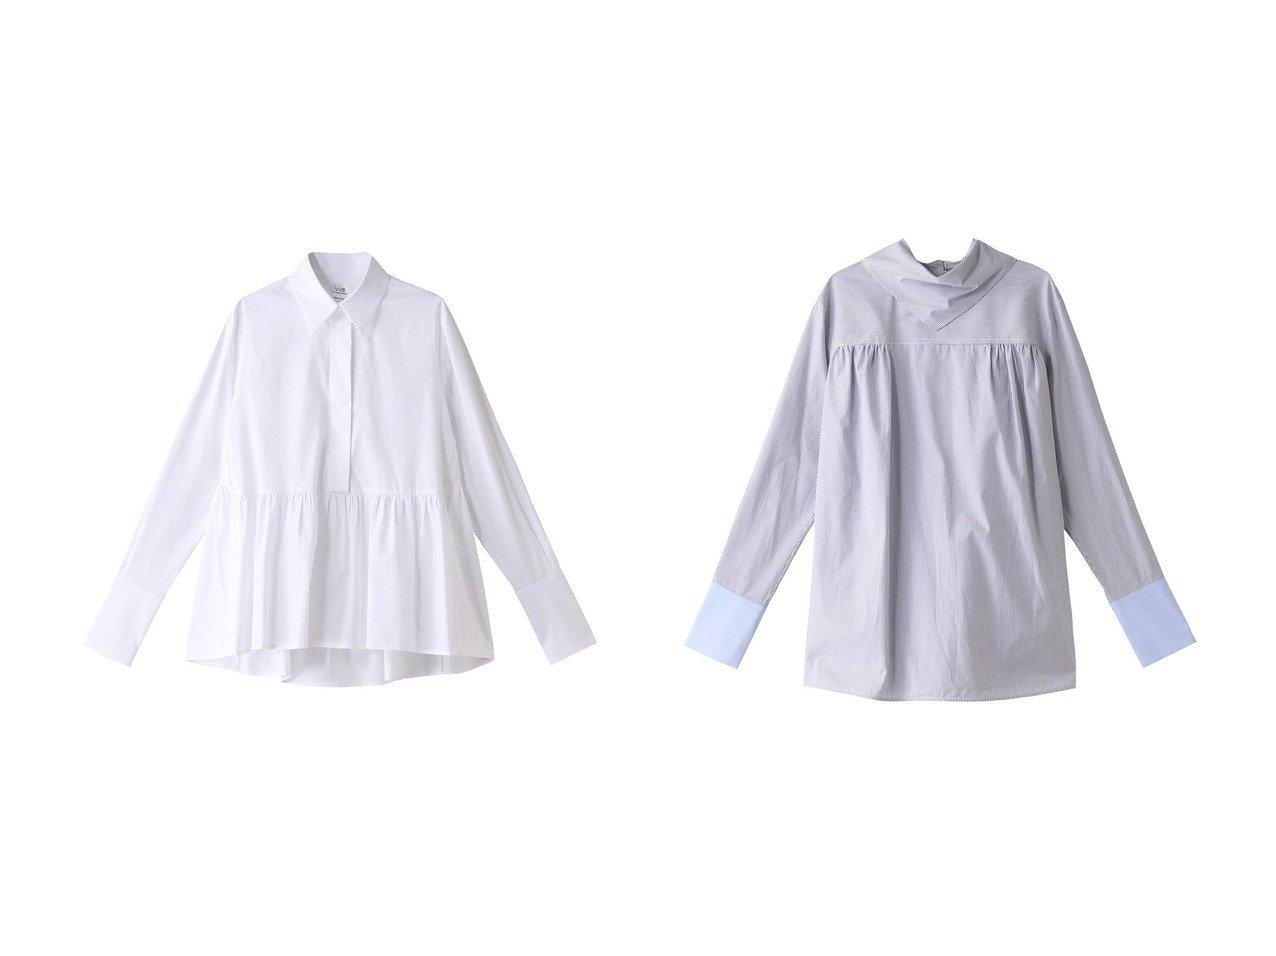 【VICTORIA, VICTORIA BECKHAM/ヴィクトリア ヴィクトリア ベッカム】のパッチワークシャツ&オーガニックコットンシャツ 【トップス・カットソー】おすすめ!人気、トレンド・レディースファッションの通販 おすすめで人気の流行・トレンド、ファッションの通販商品 メンズファッション・キッズファッション・インテリア・家具・レディースファッション・服の通販 founy(ファニー) https://founy.com/ ファッション Fashion レディースファッション WOMEN トップス・カットソー Tops/Tshirt シャツ/ブラウス Shirts/Blouses ギャザー スリーブ フェミニン ベーシック ロング  ID:crp329100000032694